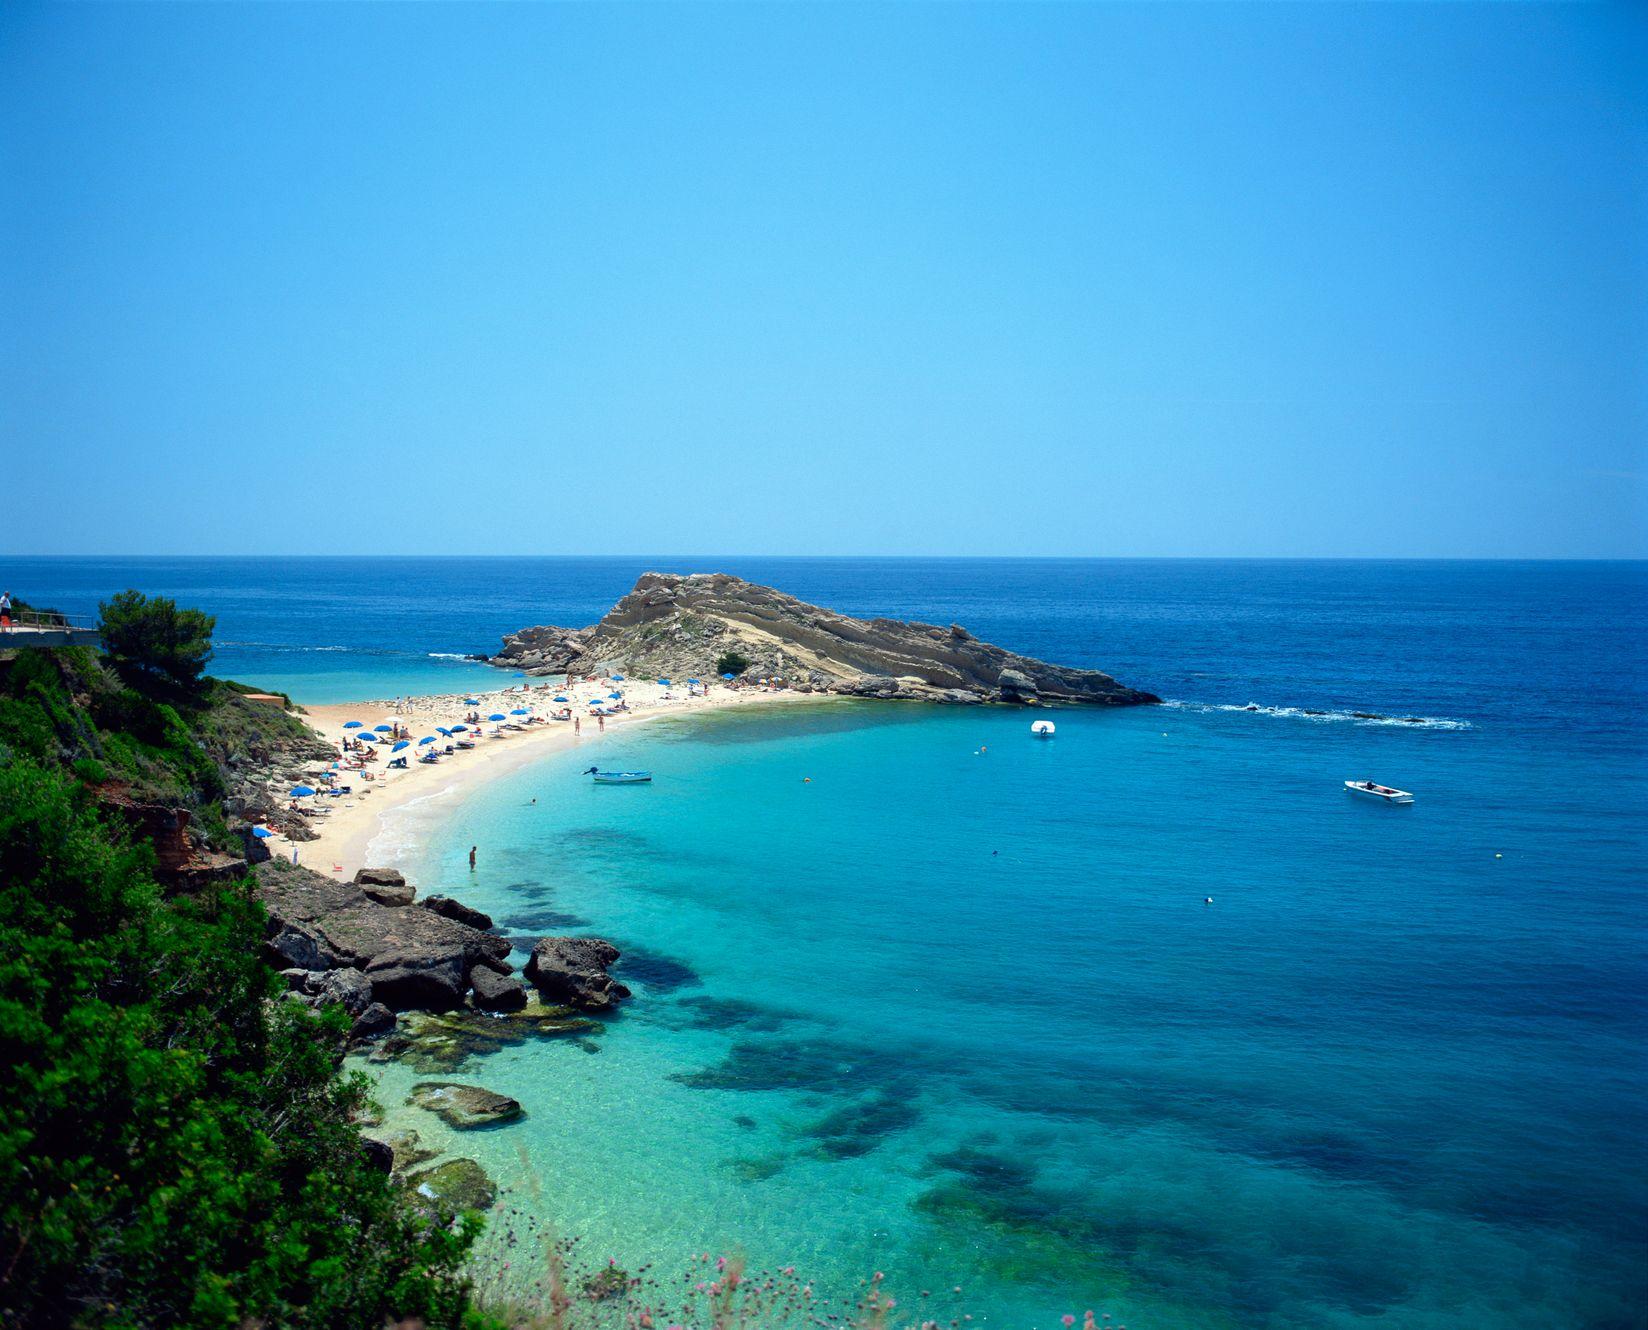 One of Kefalonia's Greek island stunning beaches